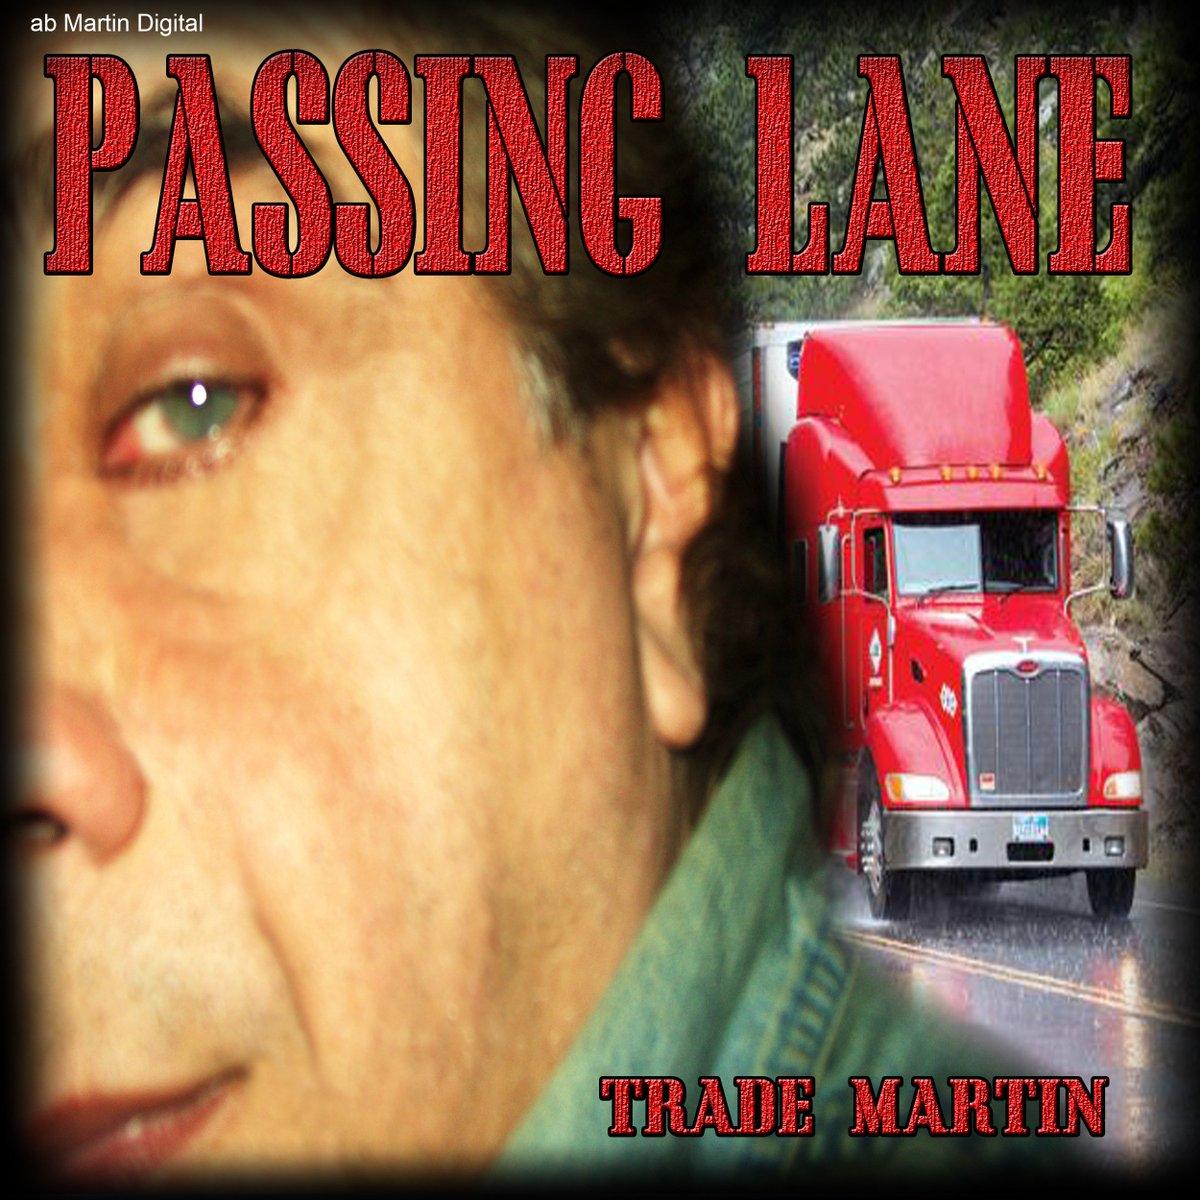 @BMGNashville .Passing Lane https://www.youtube.com/watch?v=kFuuk616_HI&feature=youtu.be… #TradeMartin #abMartindigital #iTunes #Spotify #Amazon #AppleMusic #Pandora #CountryMusic